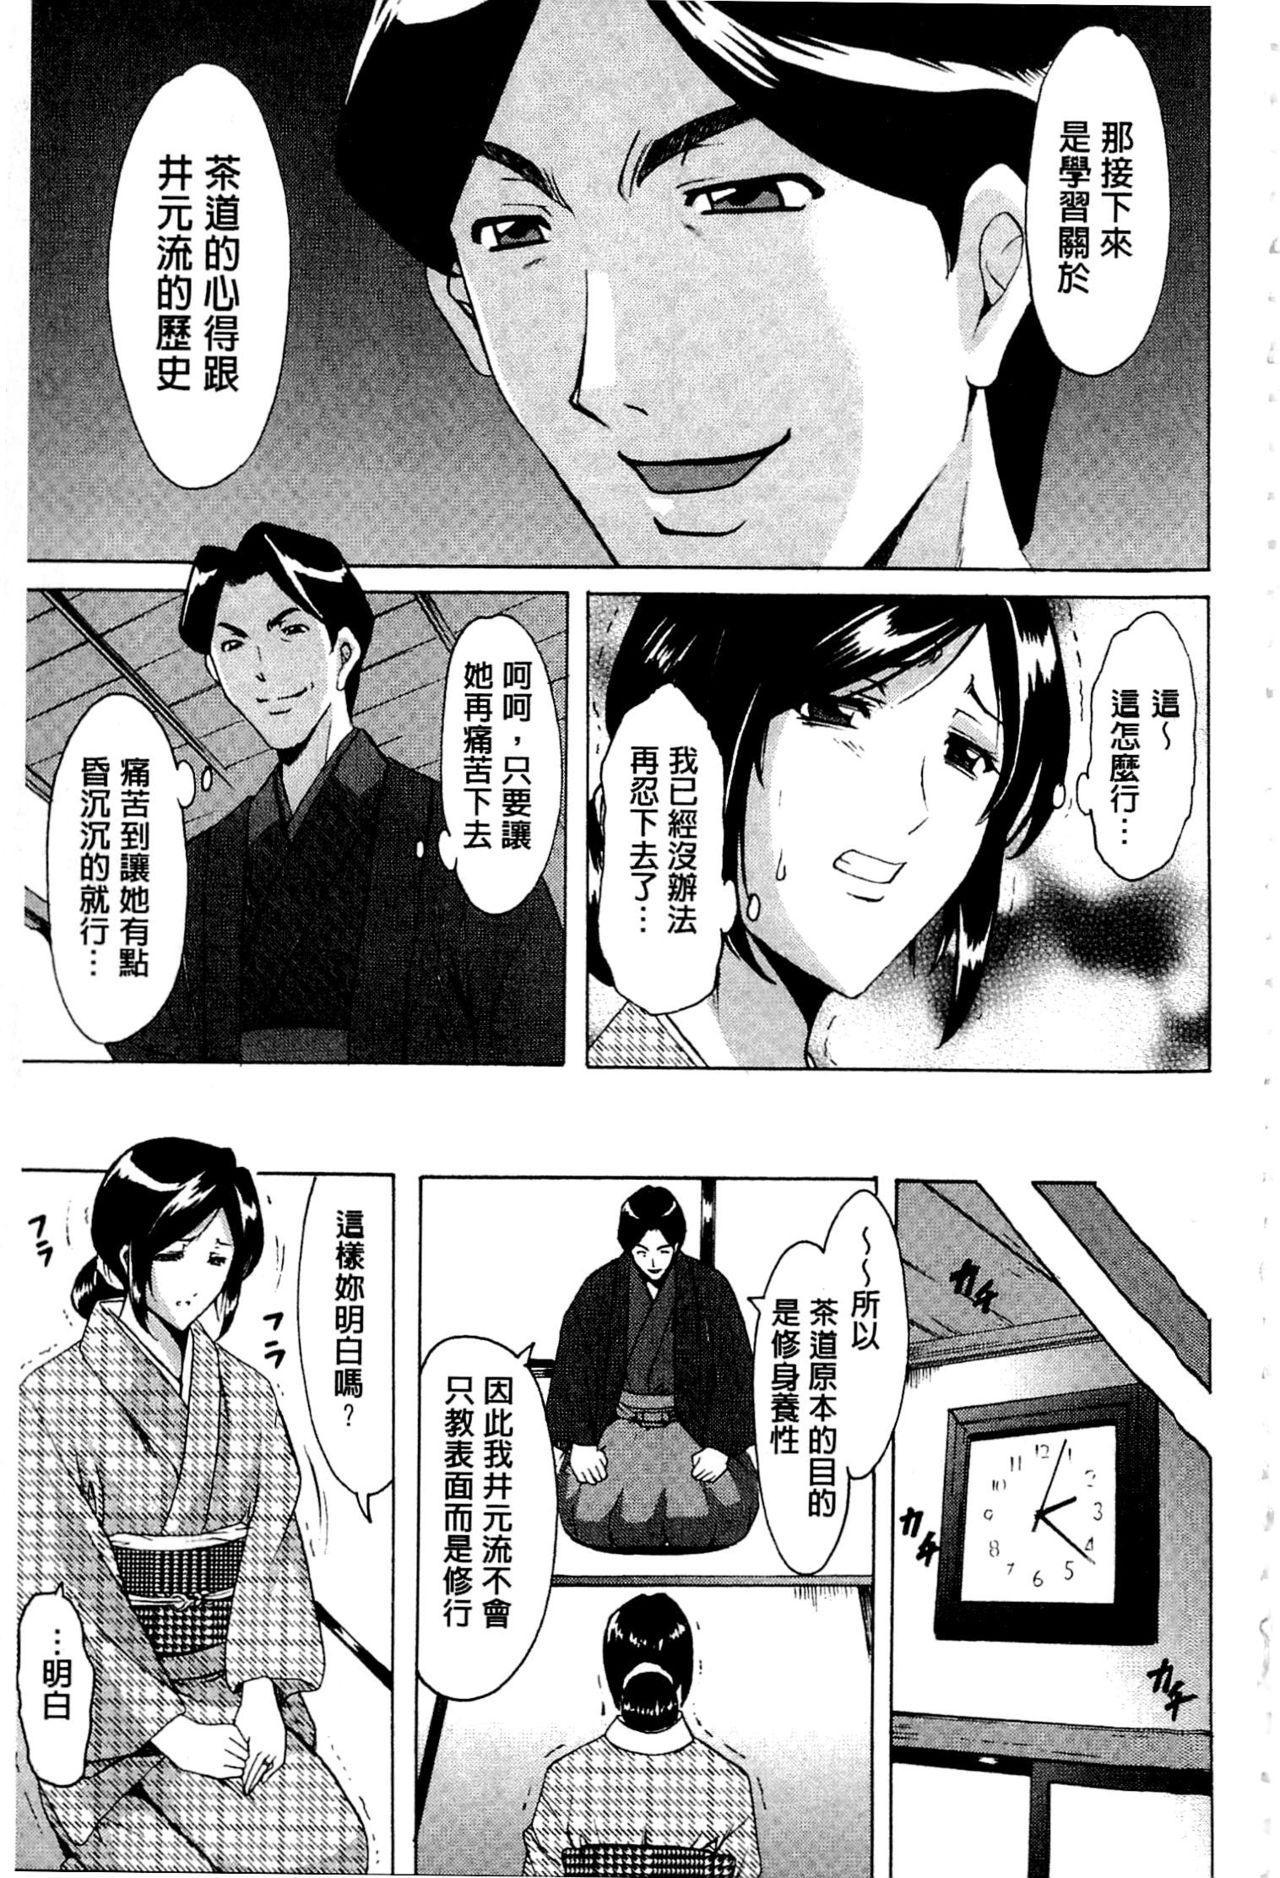 Sennyu Tsuma Satomi Kiroku | 臥底人妻里美 洗腦凌辱的記錄 上集 122